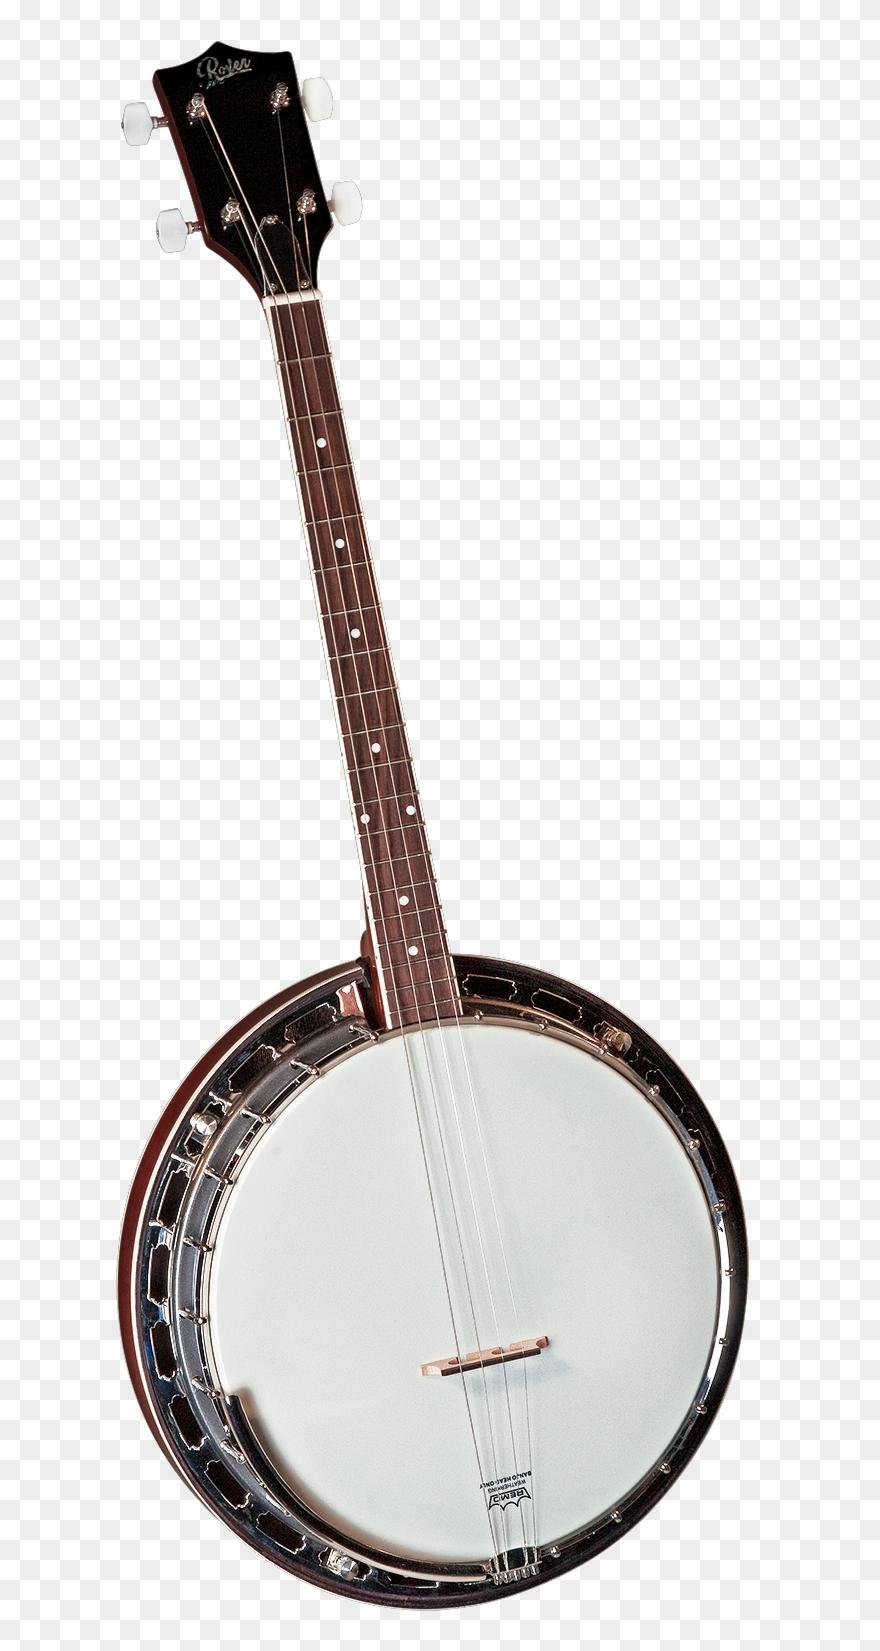 banjo # 5166841